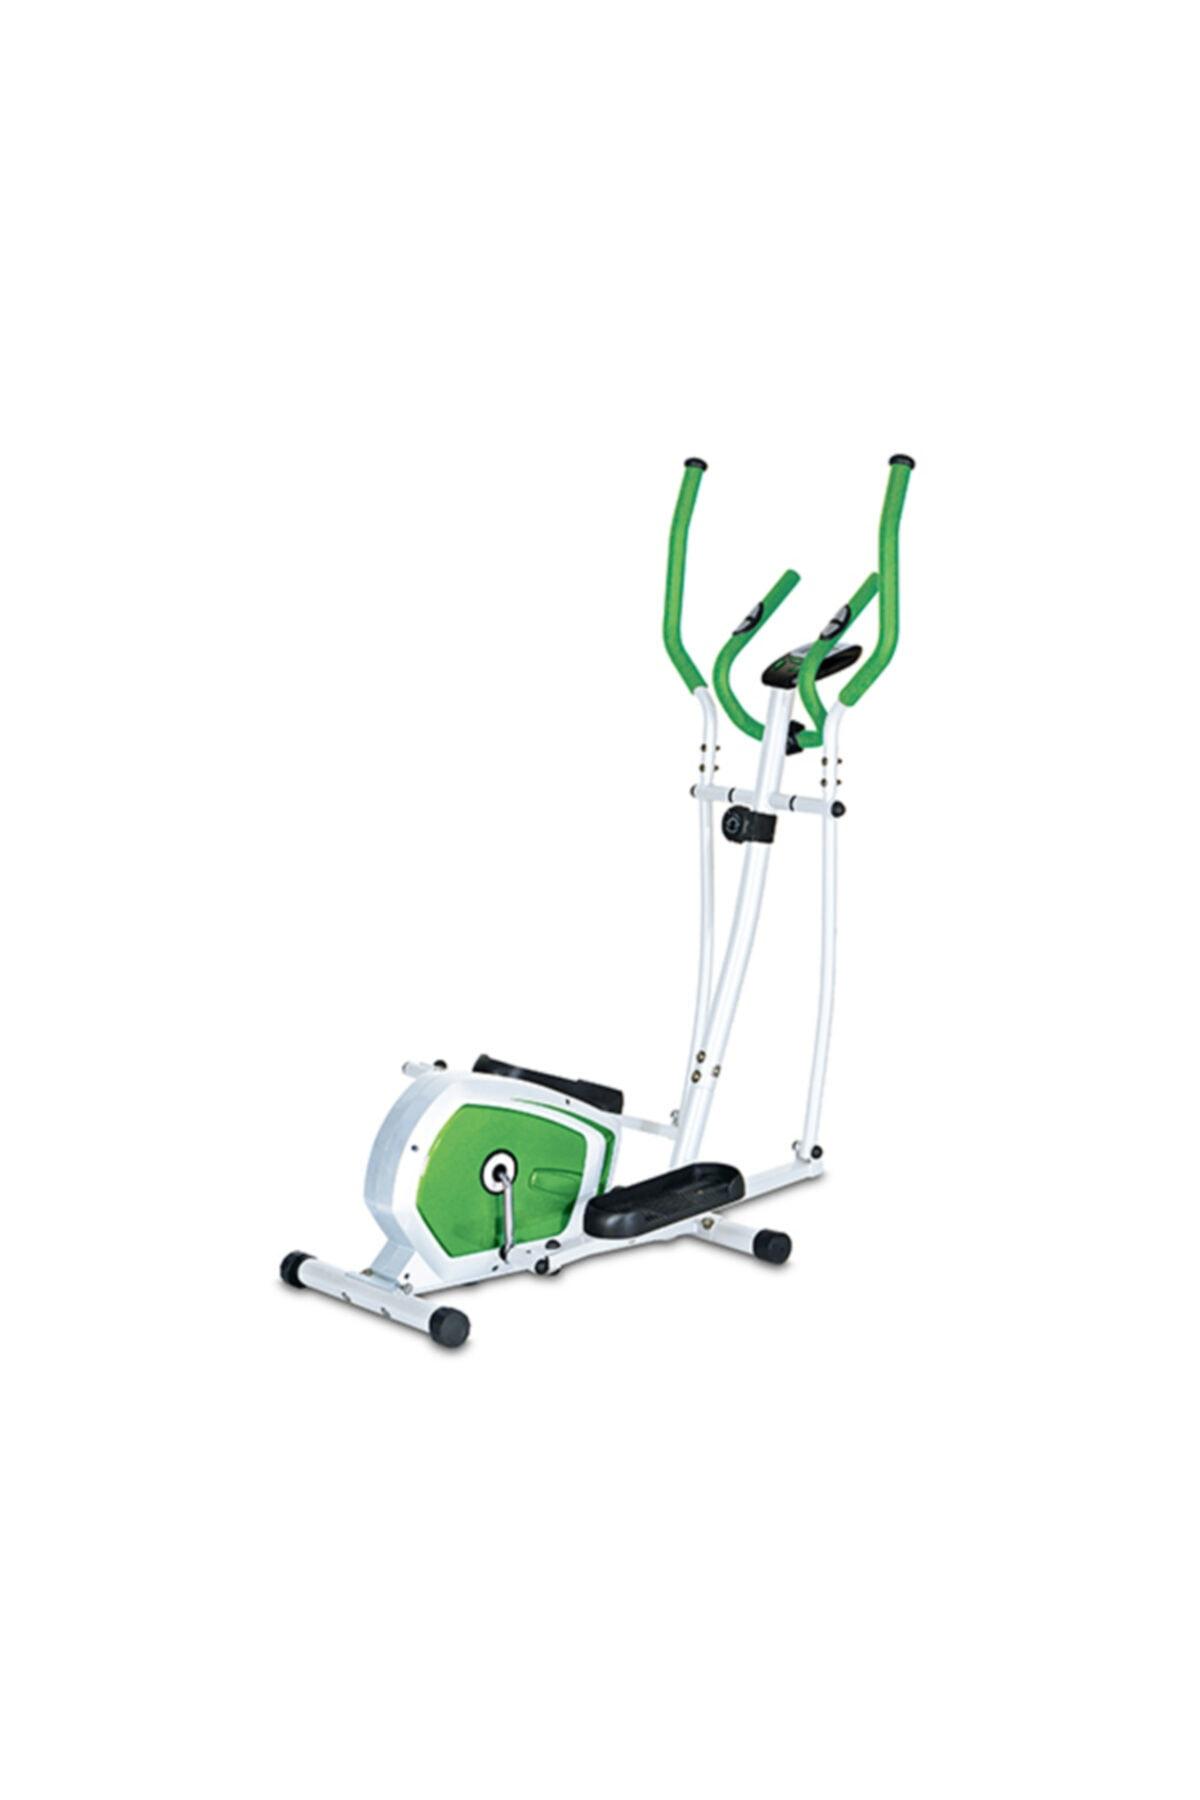 Dynamic Dynamıc E16 Eliptik Bisiklet 1dybse16/104 1